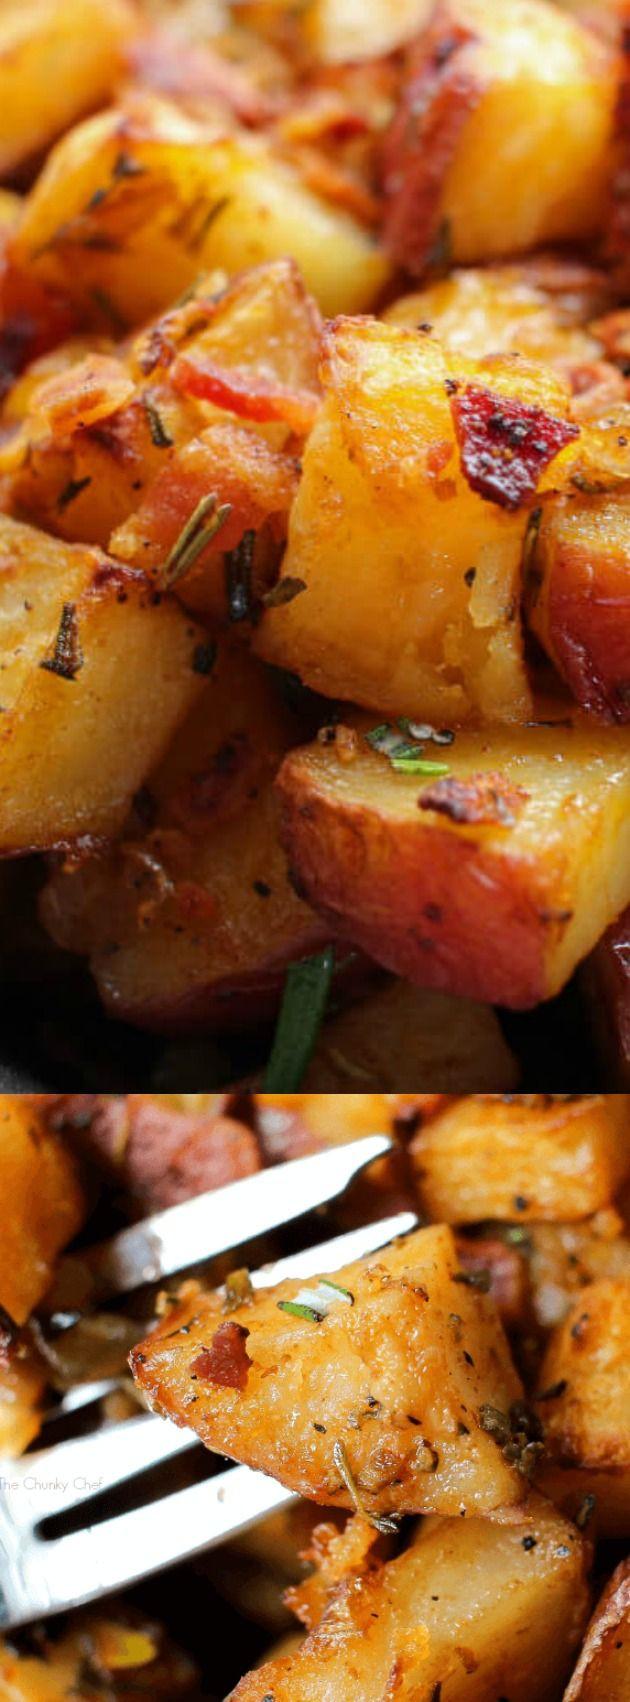 Breakfast Red Potatoes  Oven Roasted Breakfast Potatoes Recipe